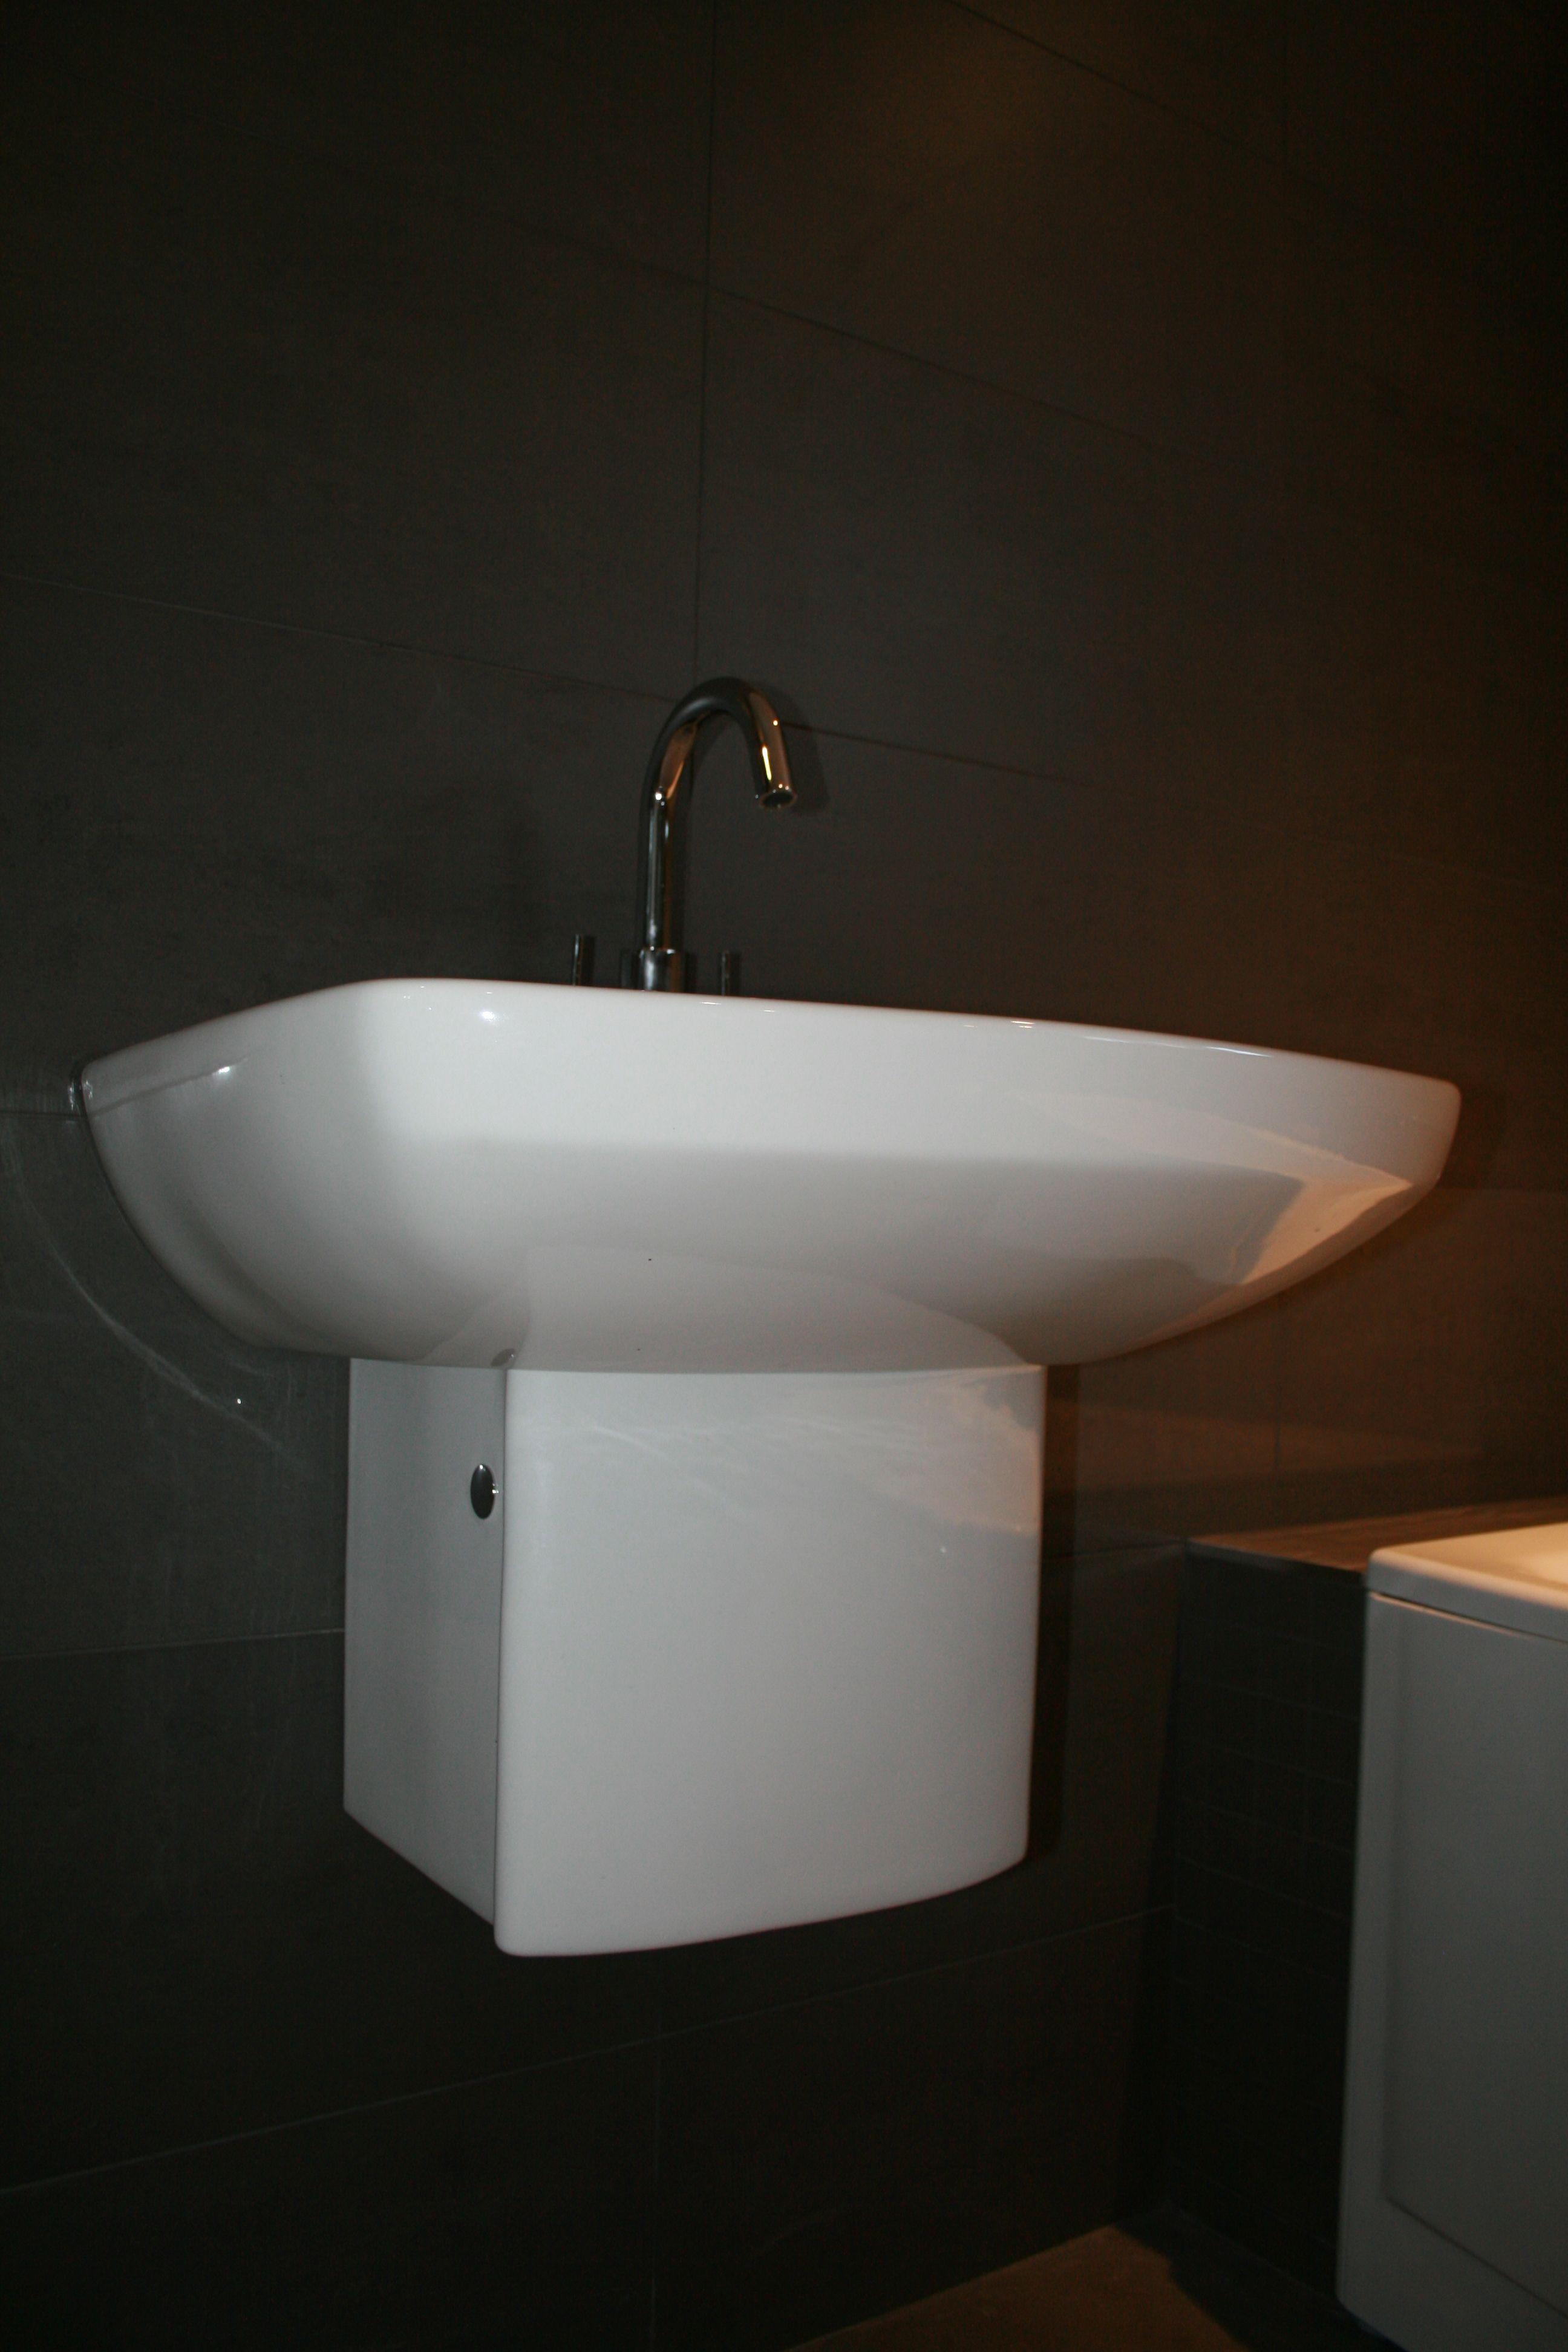 Roca Semi Pedestal Basin And Crosswater Tap Installed By Aquanero Bathroom Design Installation